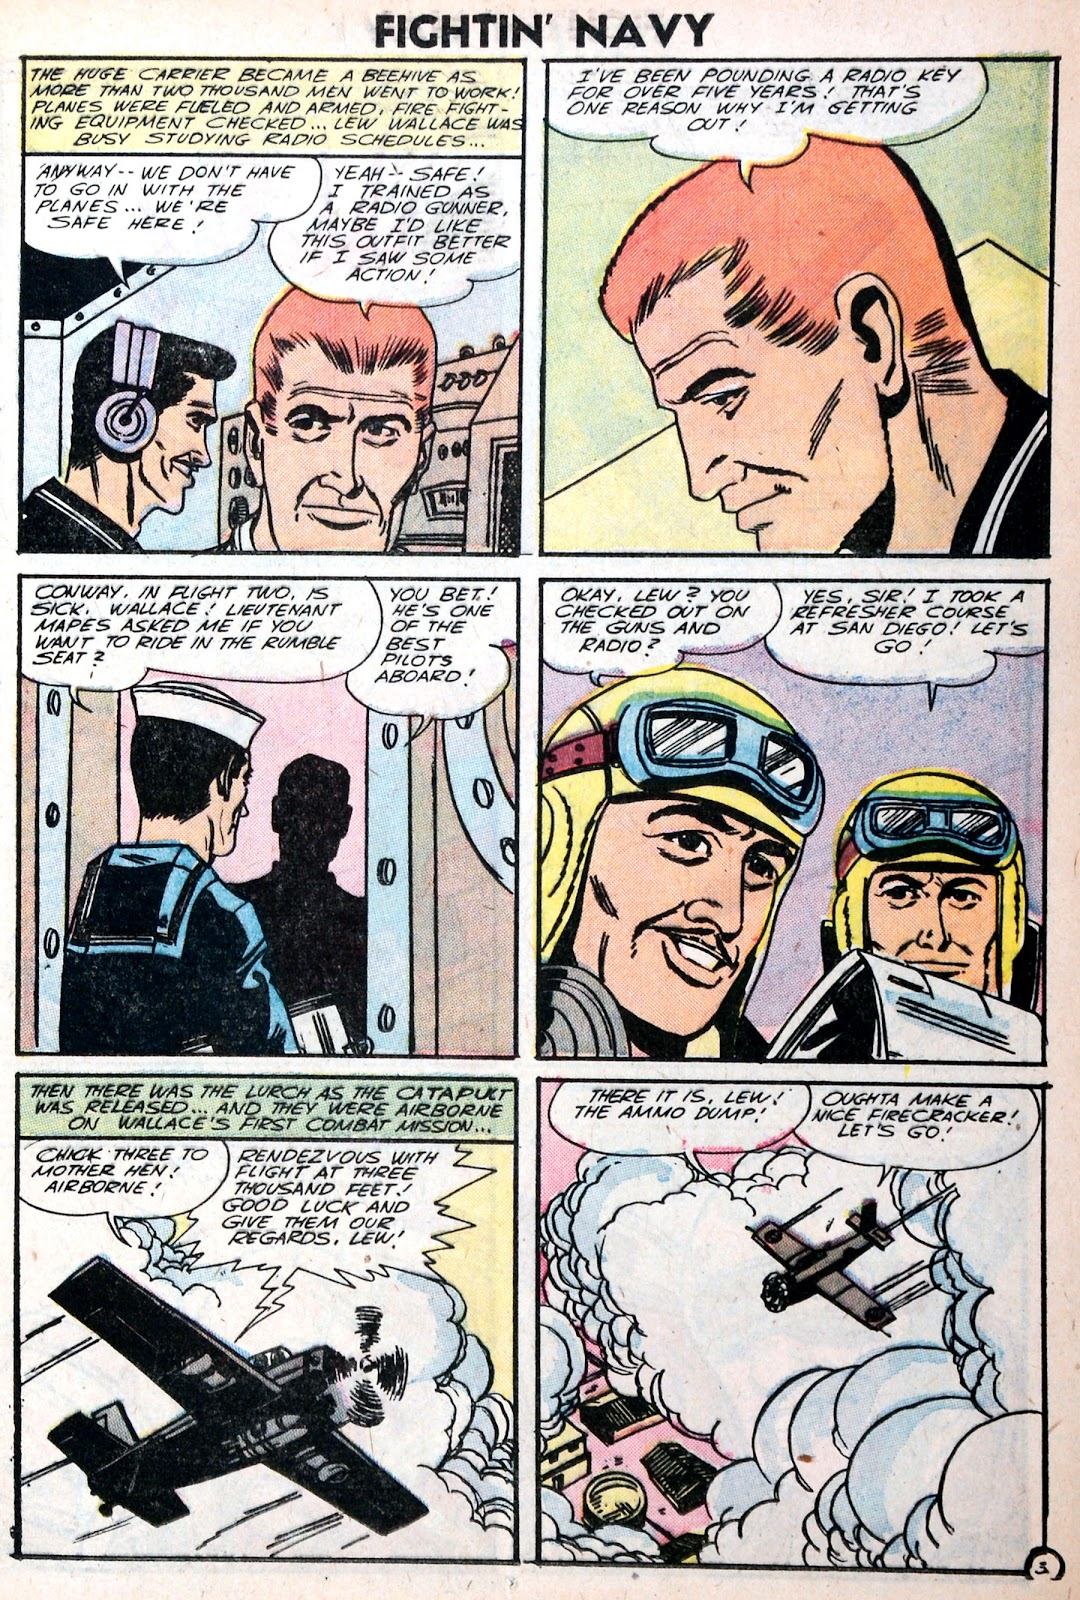 Read online Fightin' Navy comic -  Issue #75 - 13